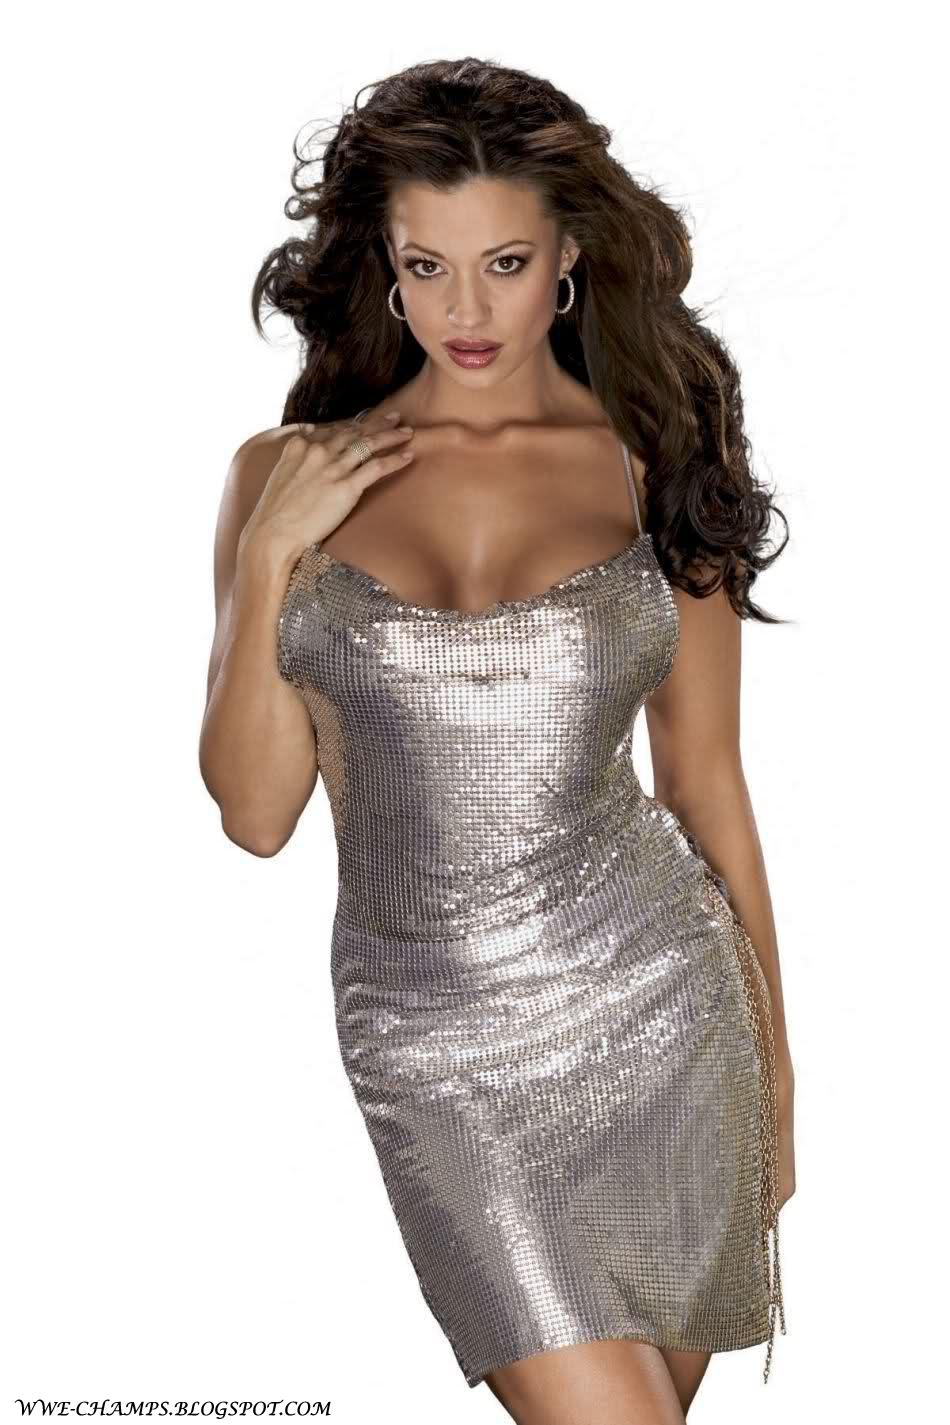 Hots Streaming Nude Candice Michelle Videos Scenes